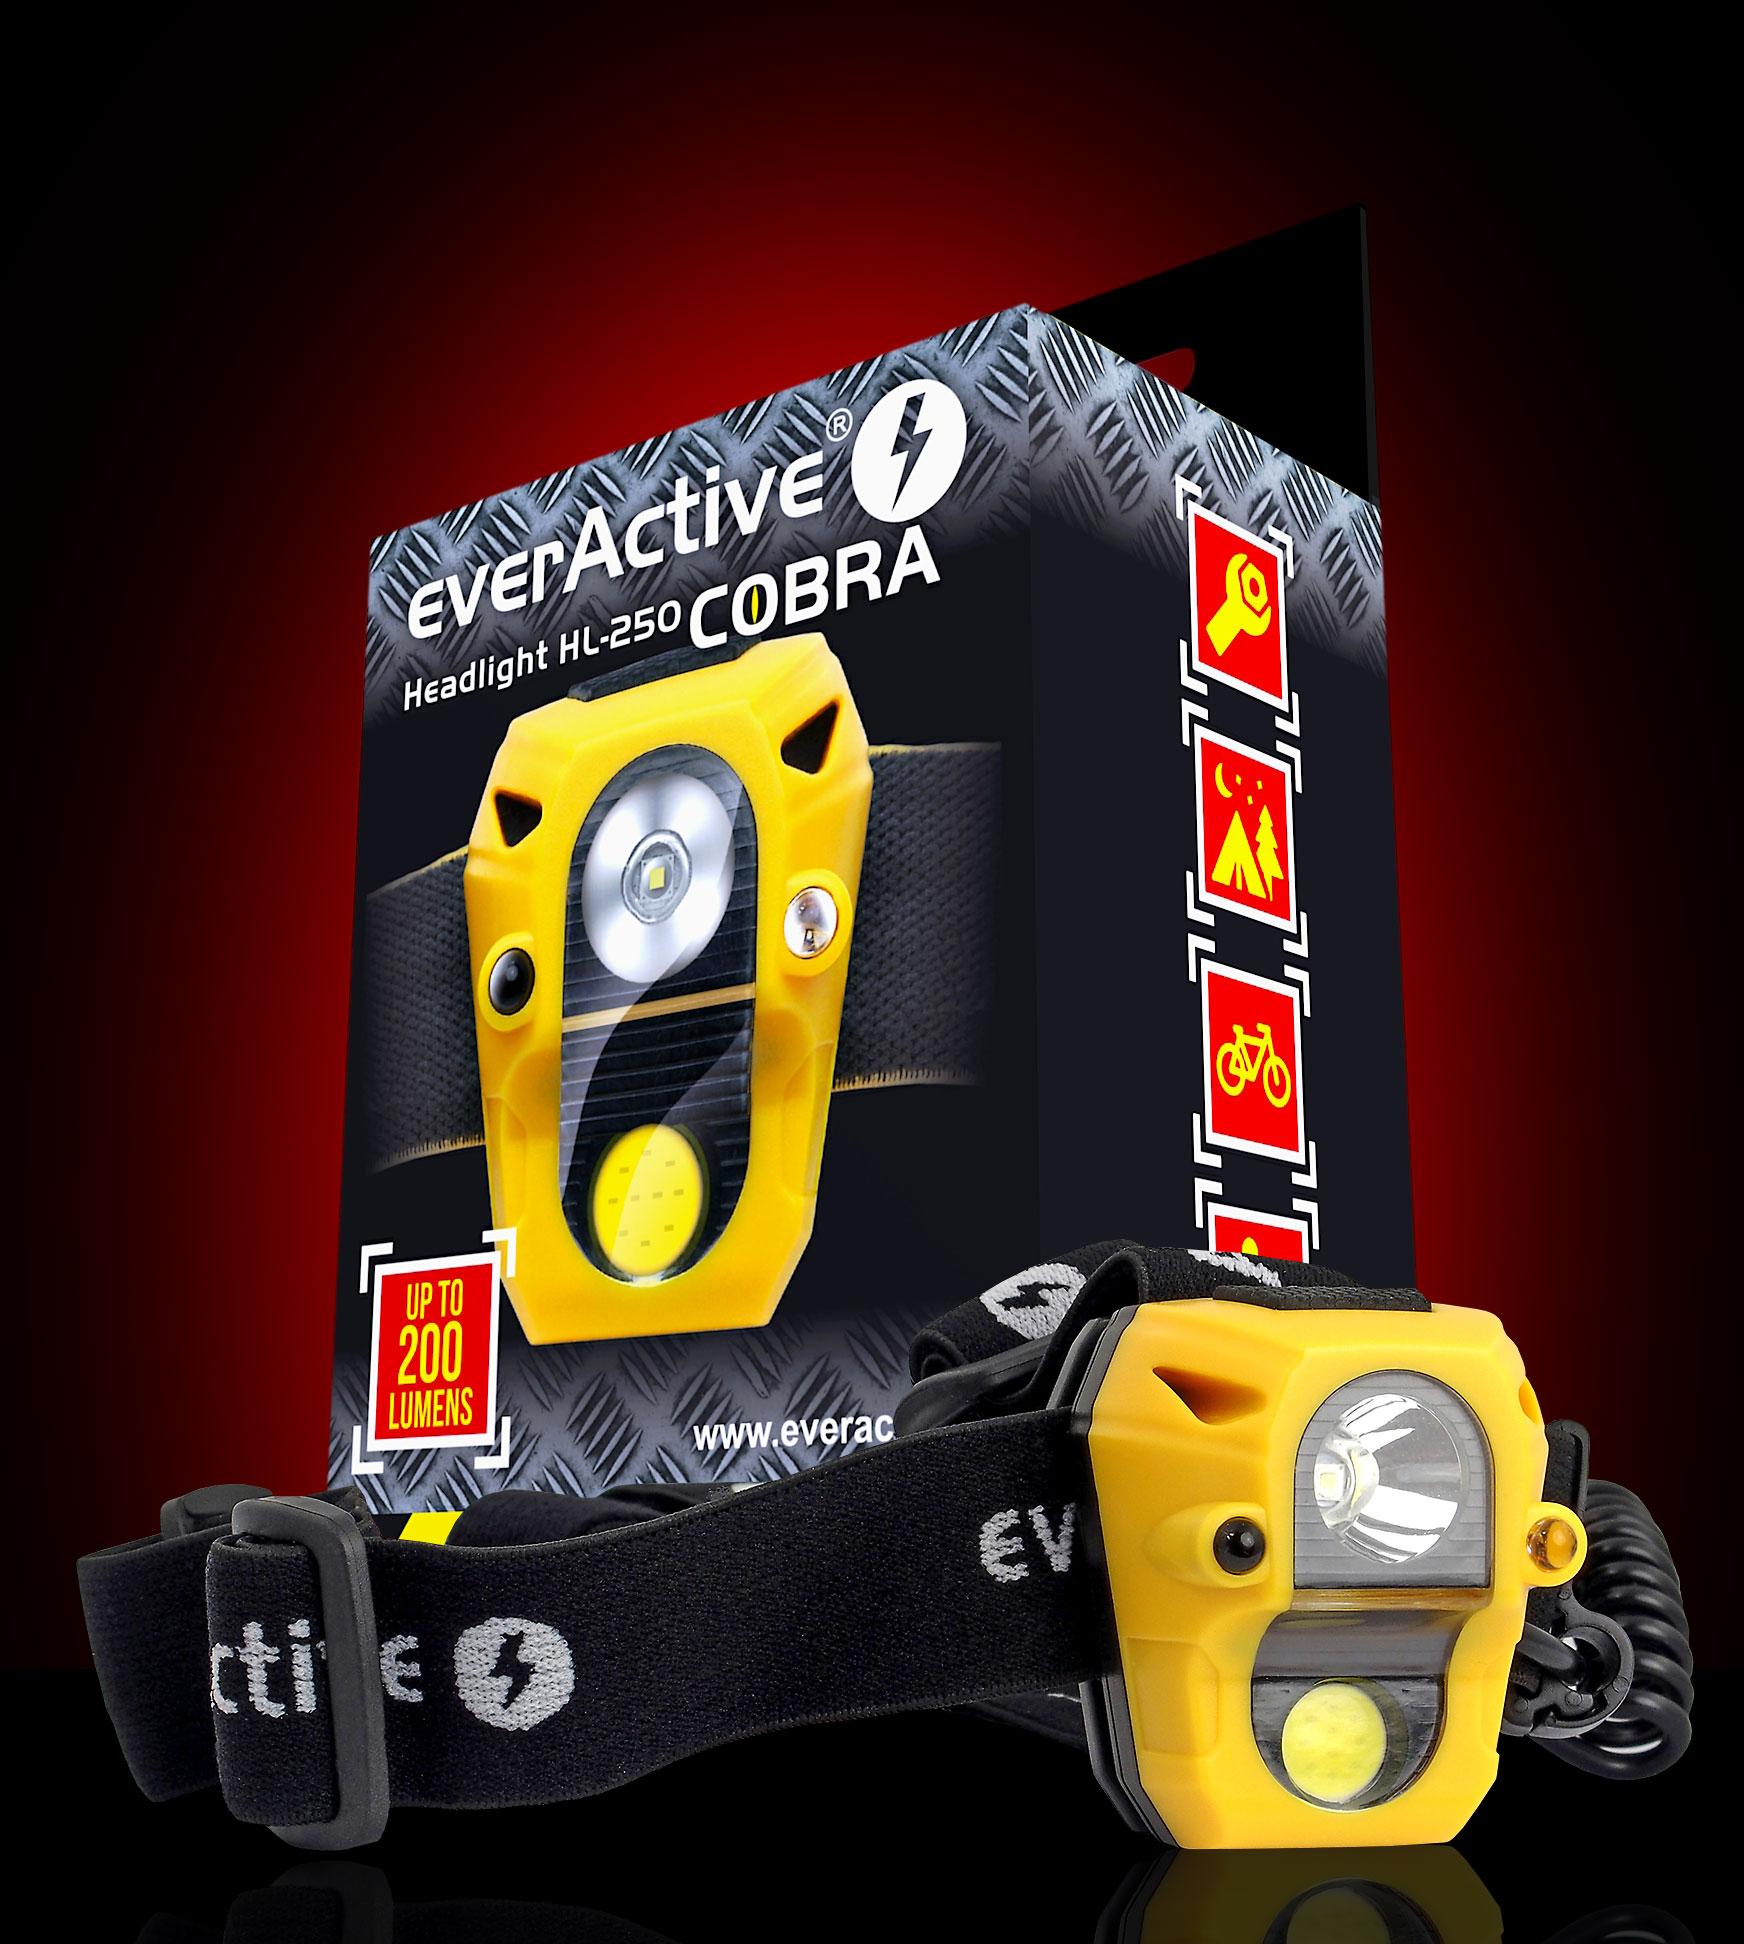 everActive new Cobra HL-250 headlight with giftbox